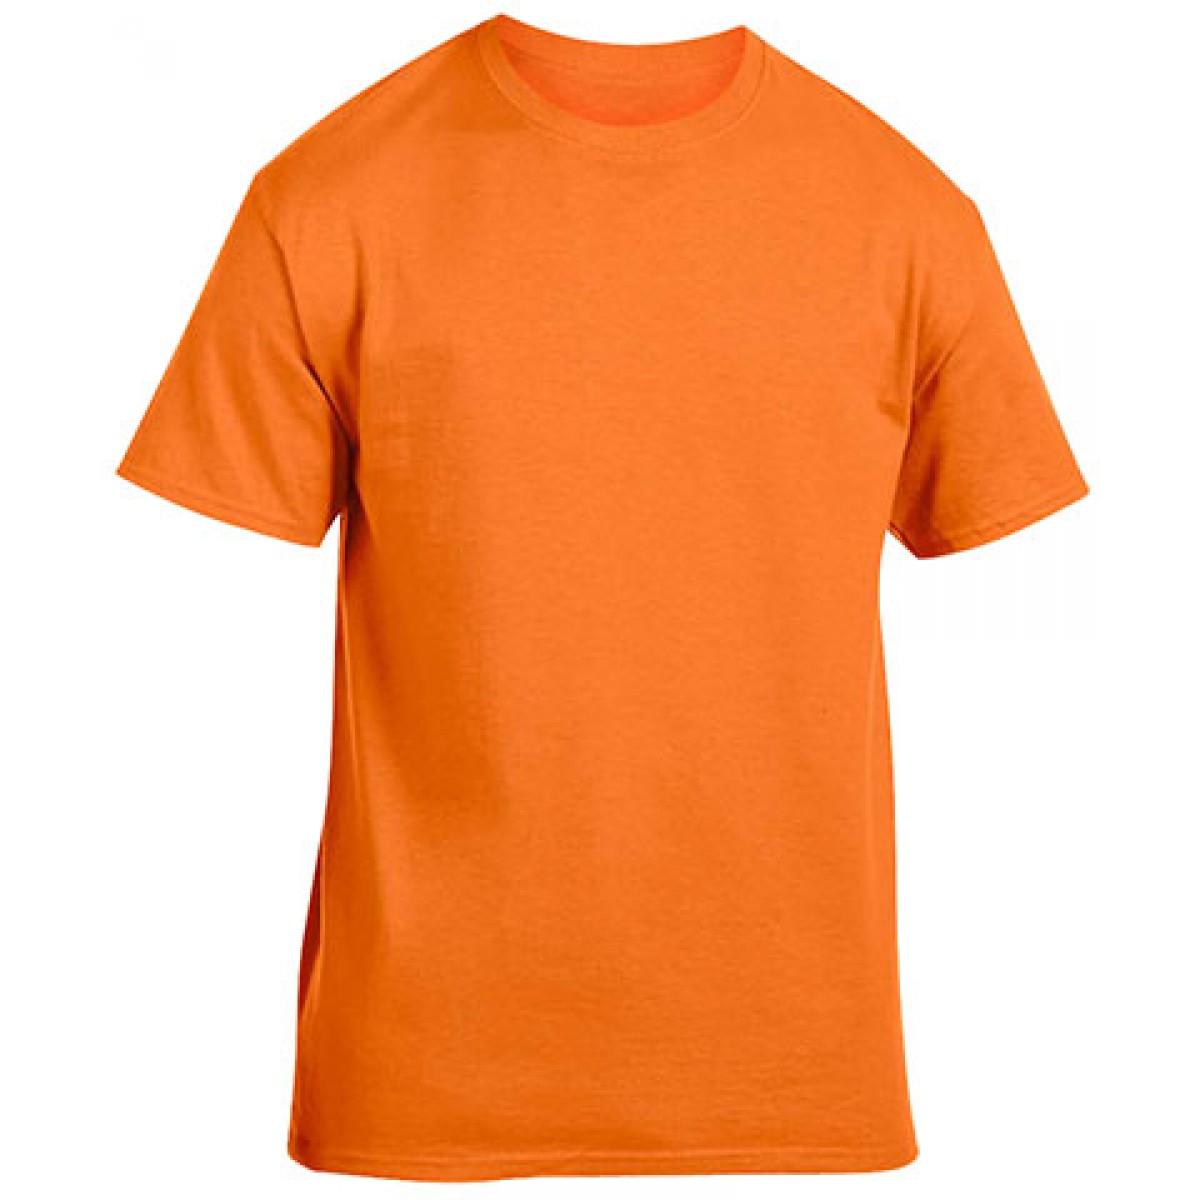 Cotton Short Sleeve T-Shirt-Safety Orange-3XL